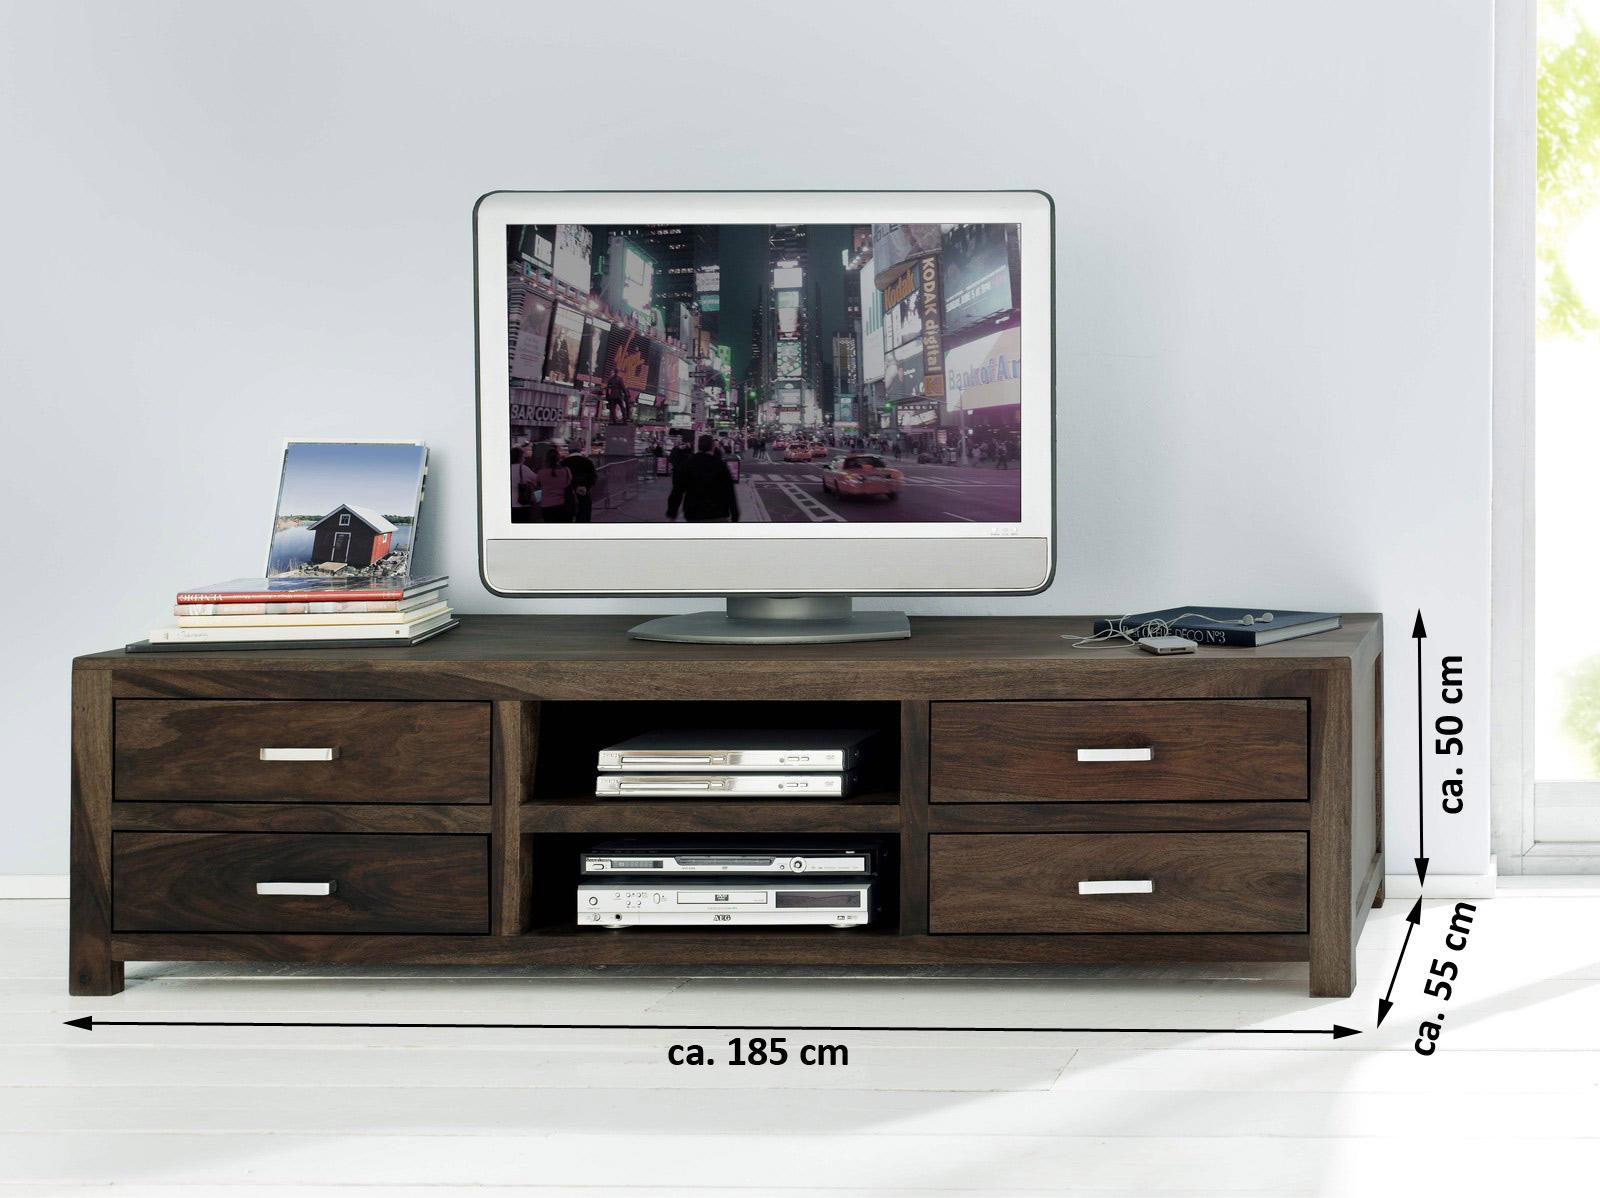 sale lowboard tv board 185x55 cm massivholz sheesham stone wiam 1521. Black Bedroom Furniture Sets. Home Design Ideas